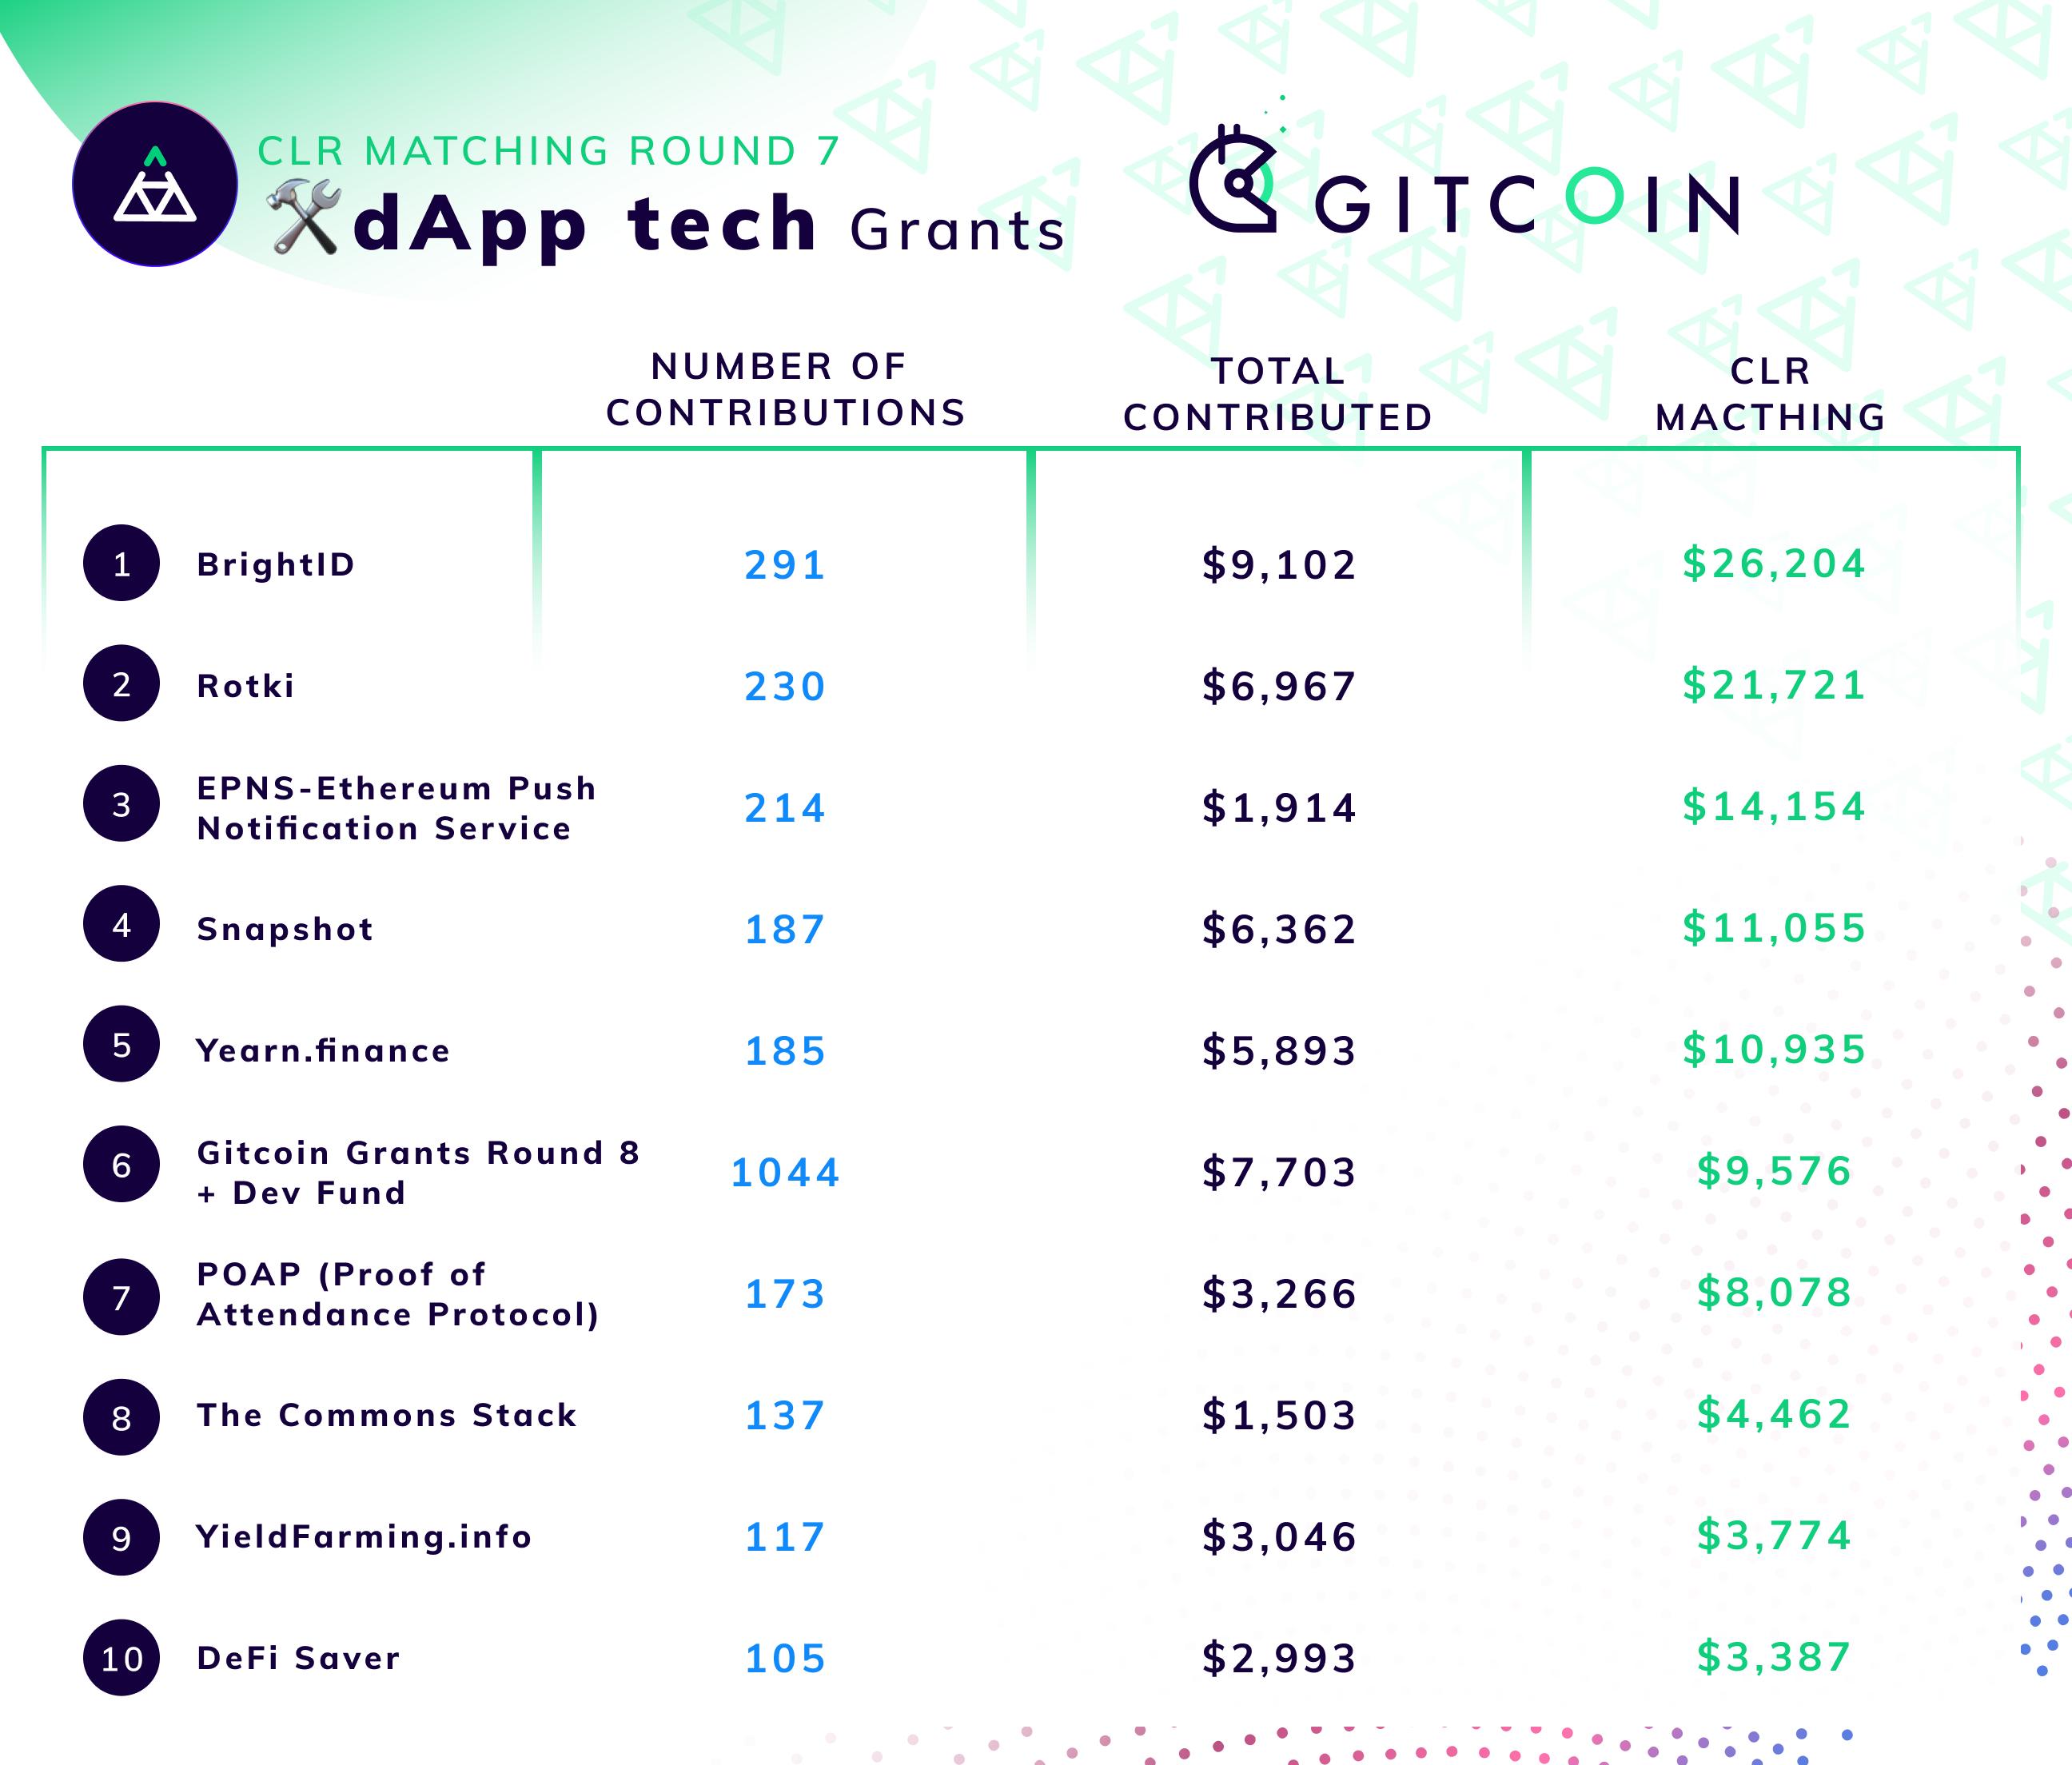 Gitcoin Grants Round 7 Retrospective